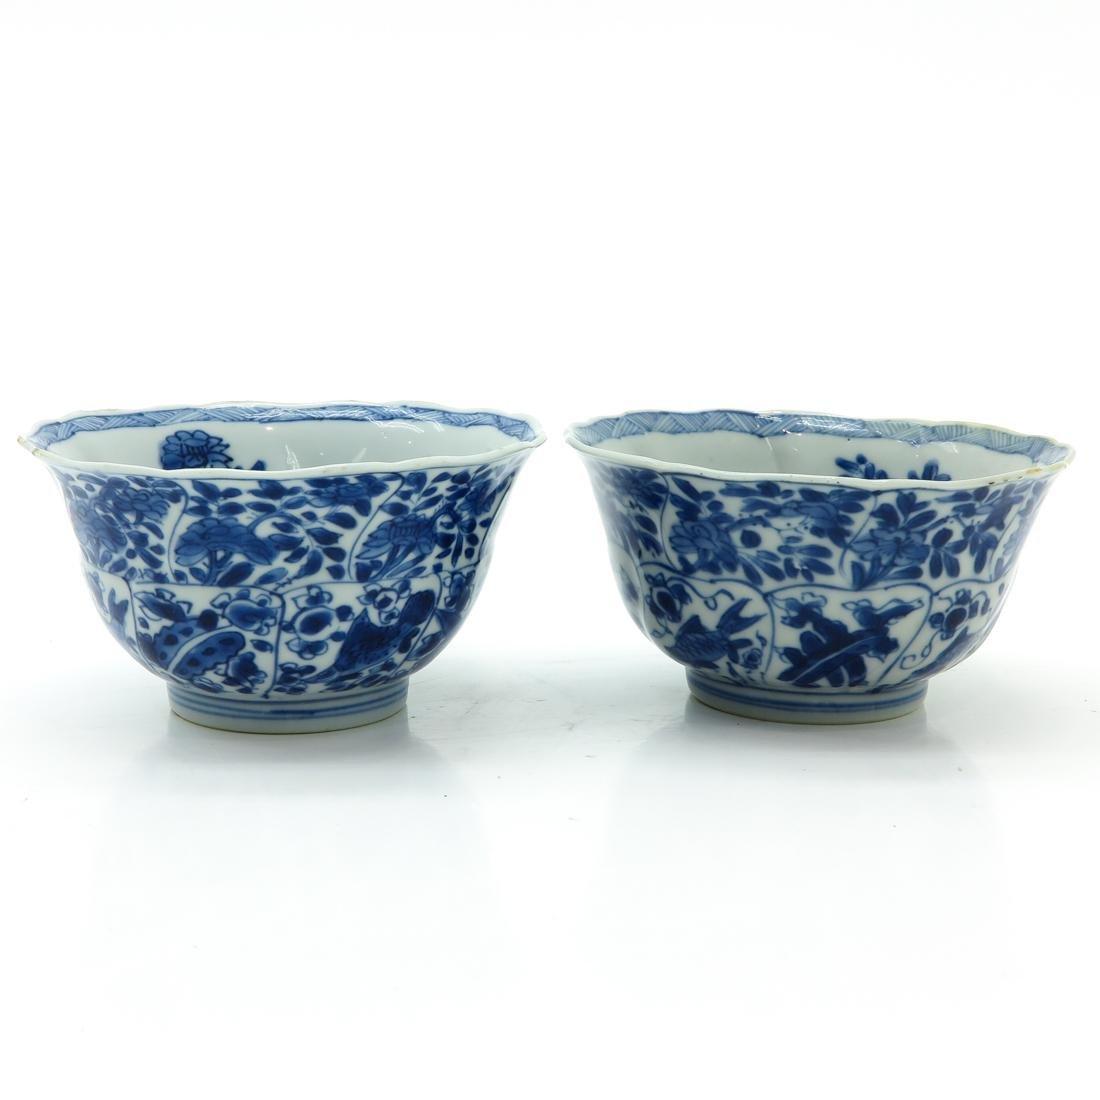 Lot of 2 Bowls - 4